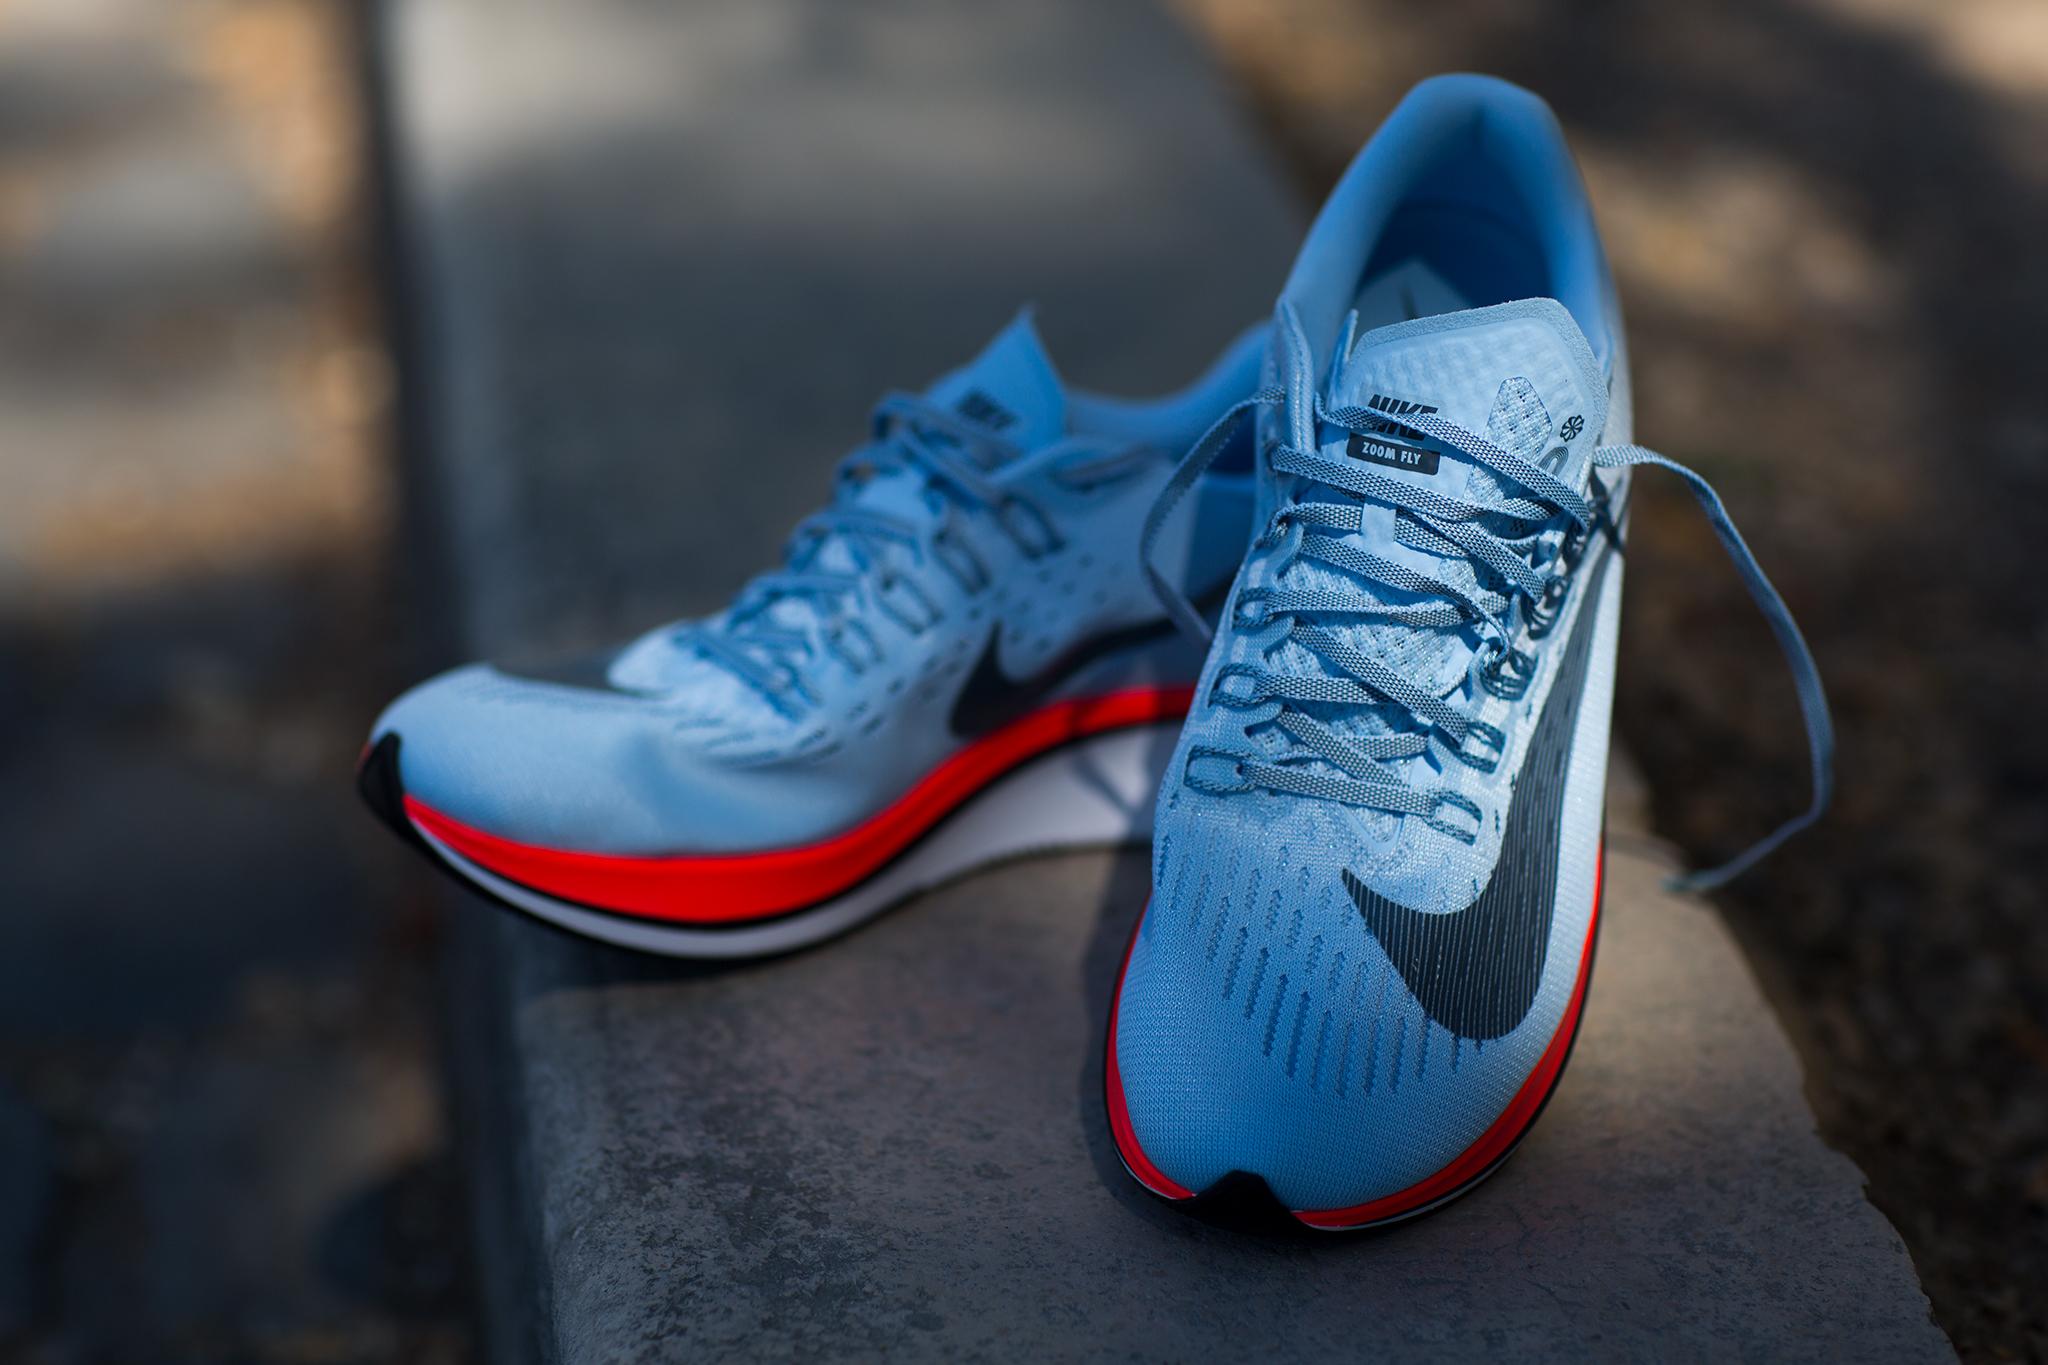 tout neuf cb7e5 4e4cd Alexis Cavelier TEST #12 : la Zoom Fly (Nike), ce bijou de ...